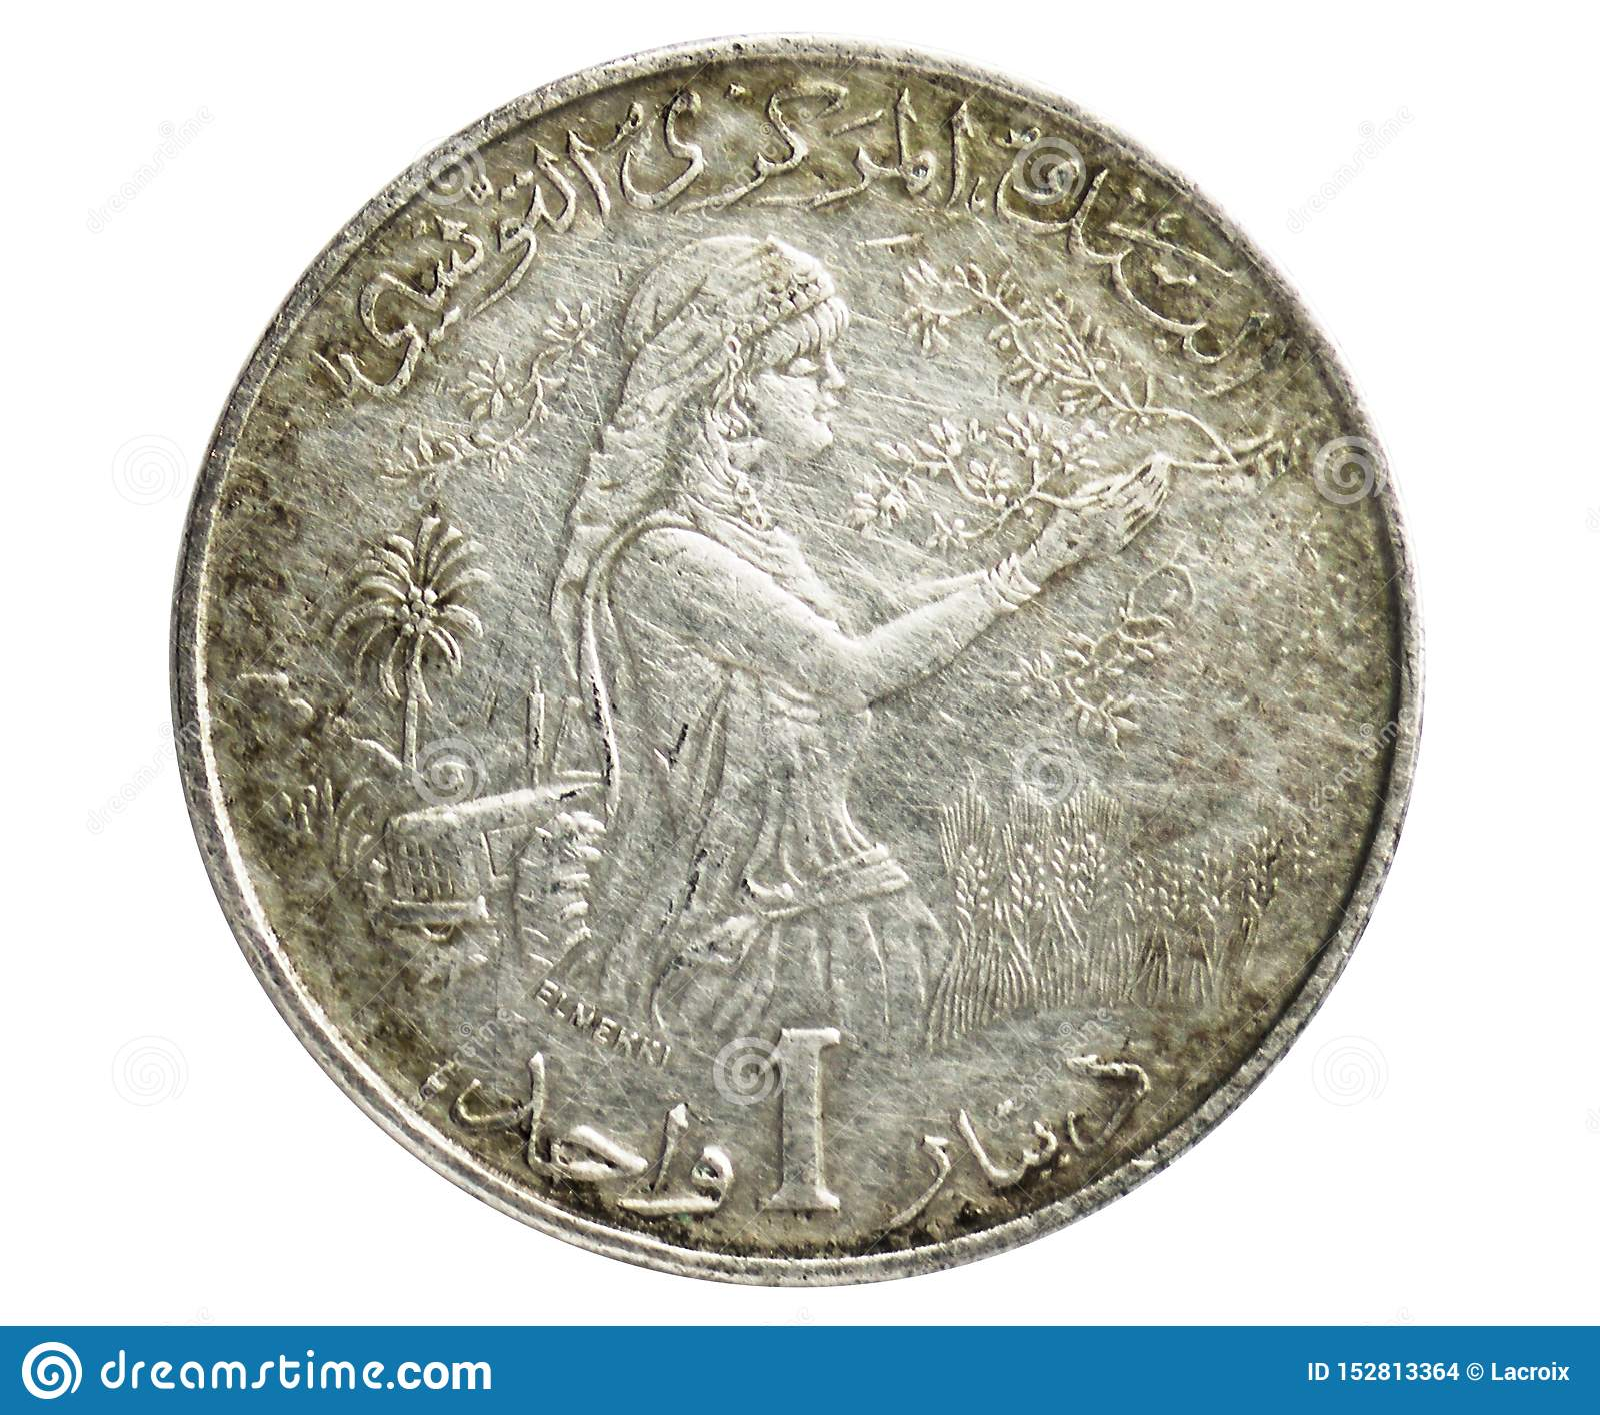 1 dinar F A Nolla mynt 1957~1987 - Bourguiba för 1st republik jubileums- serie, bank av Tunisien